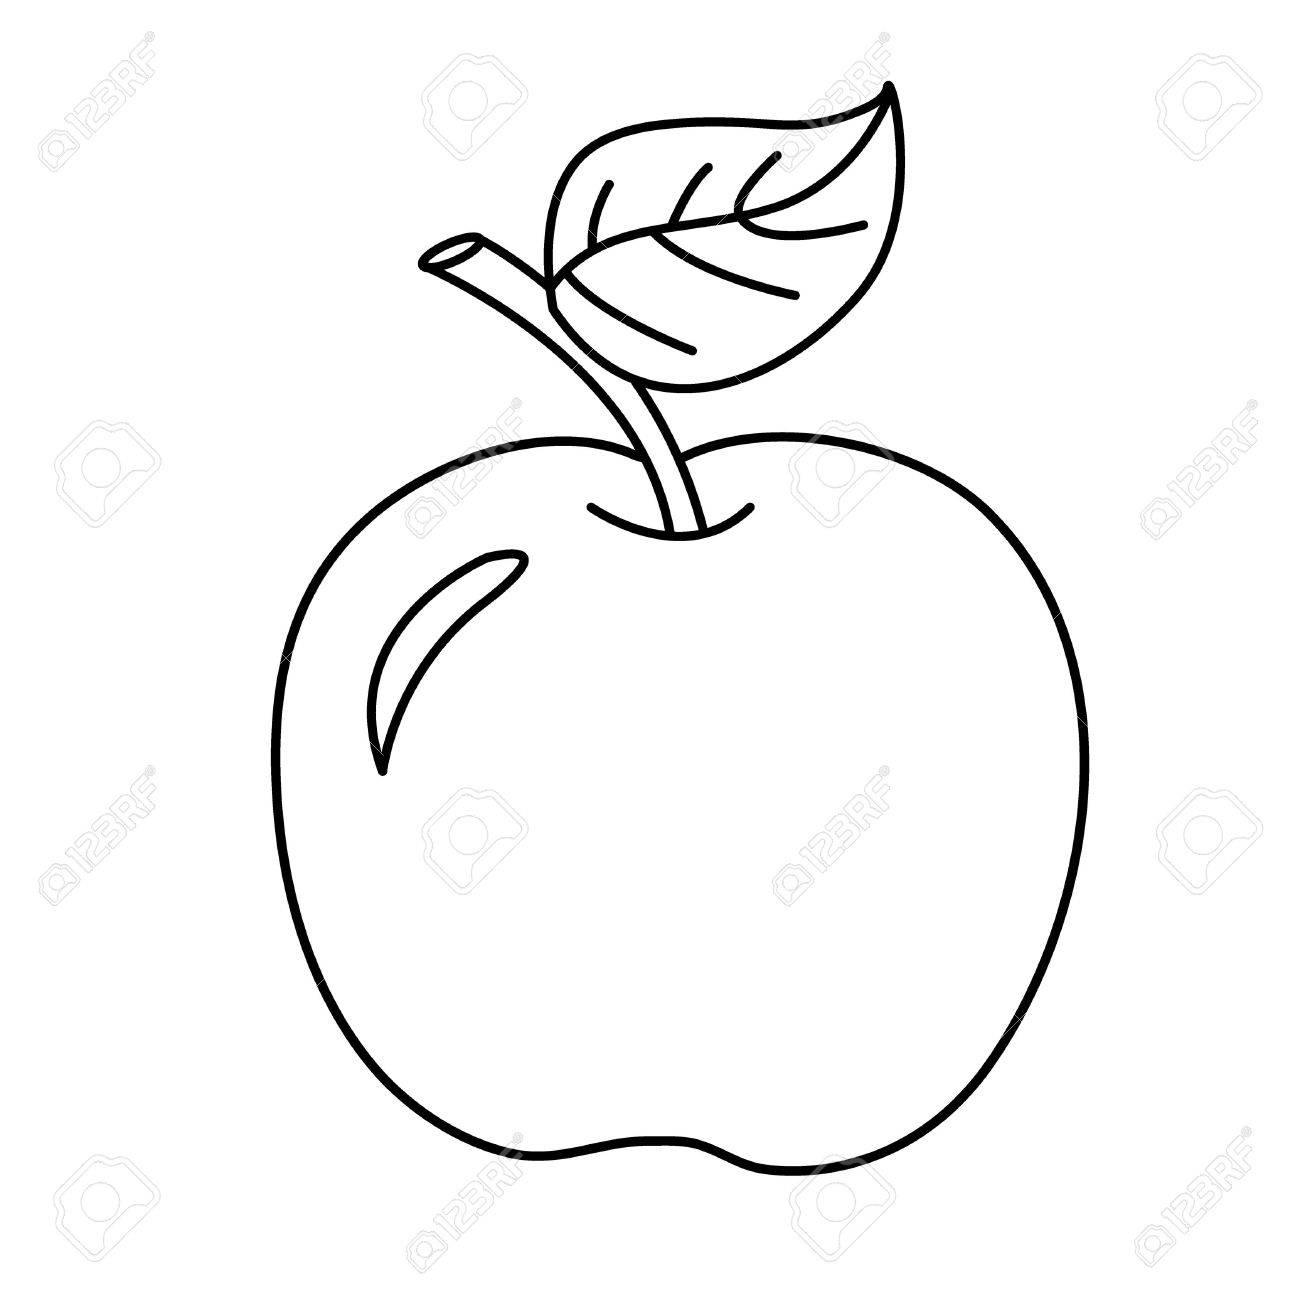 Apple Cartoon Drawing At Getdrawings